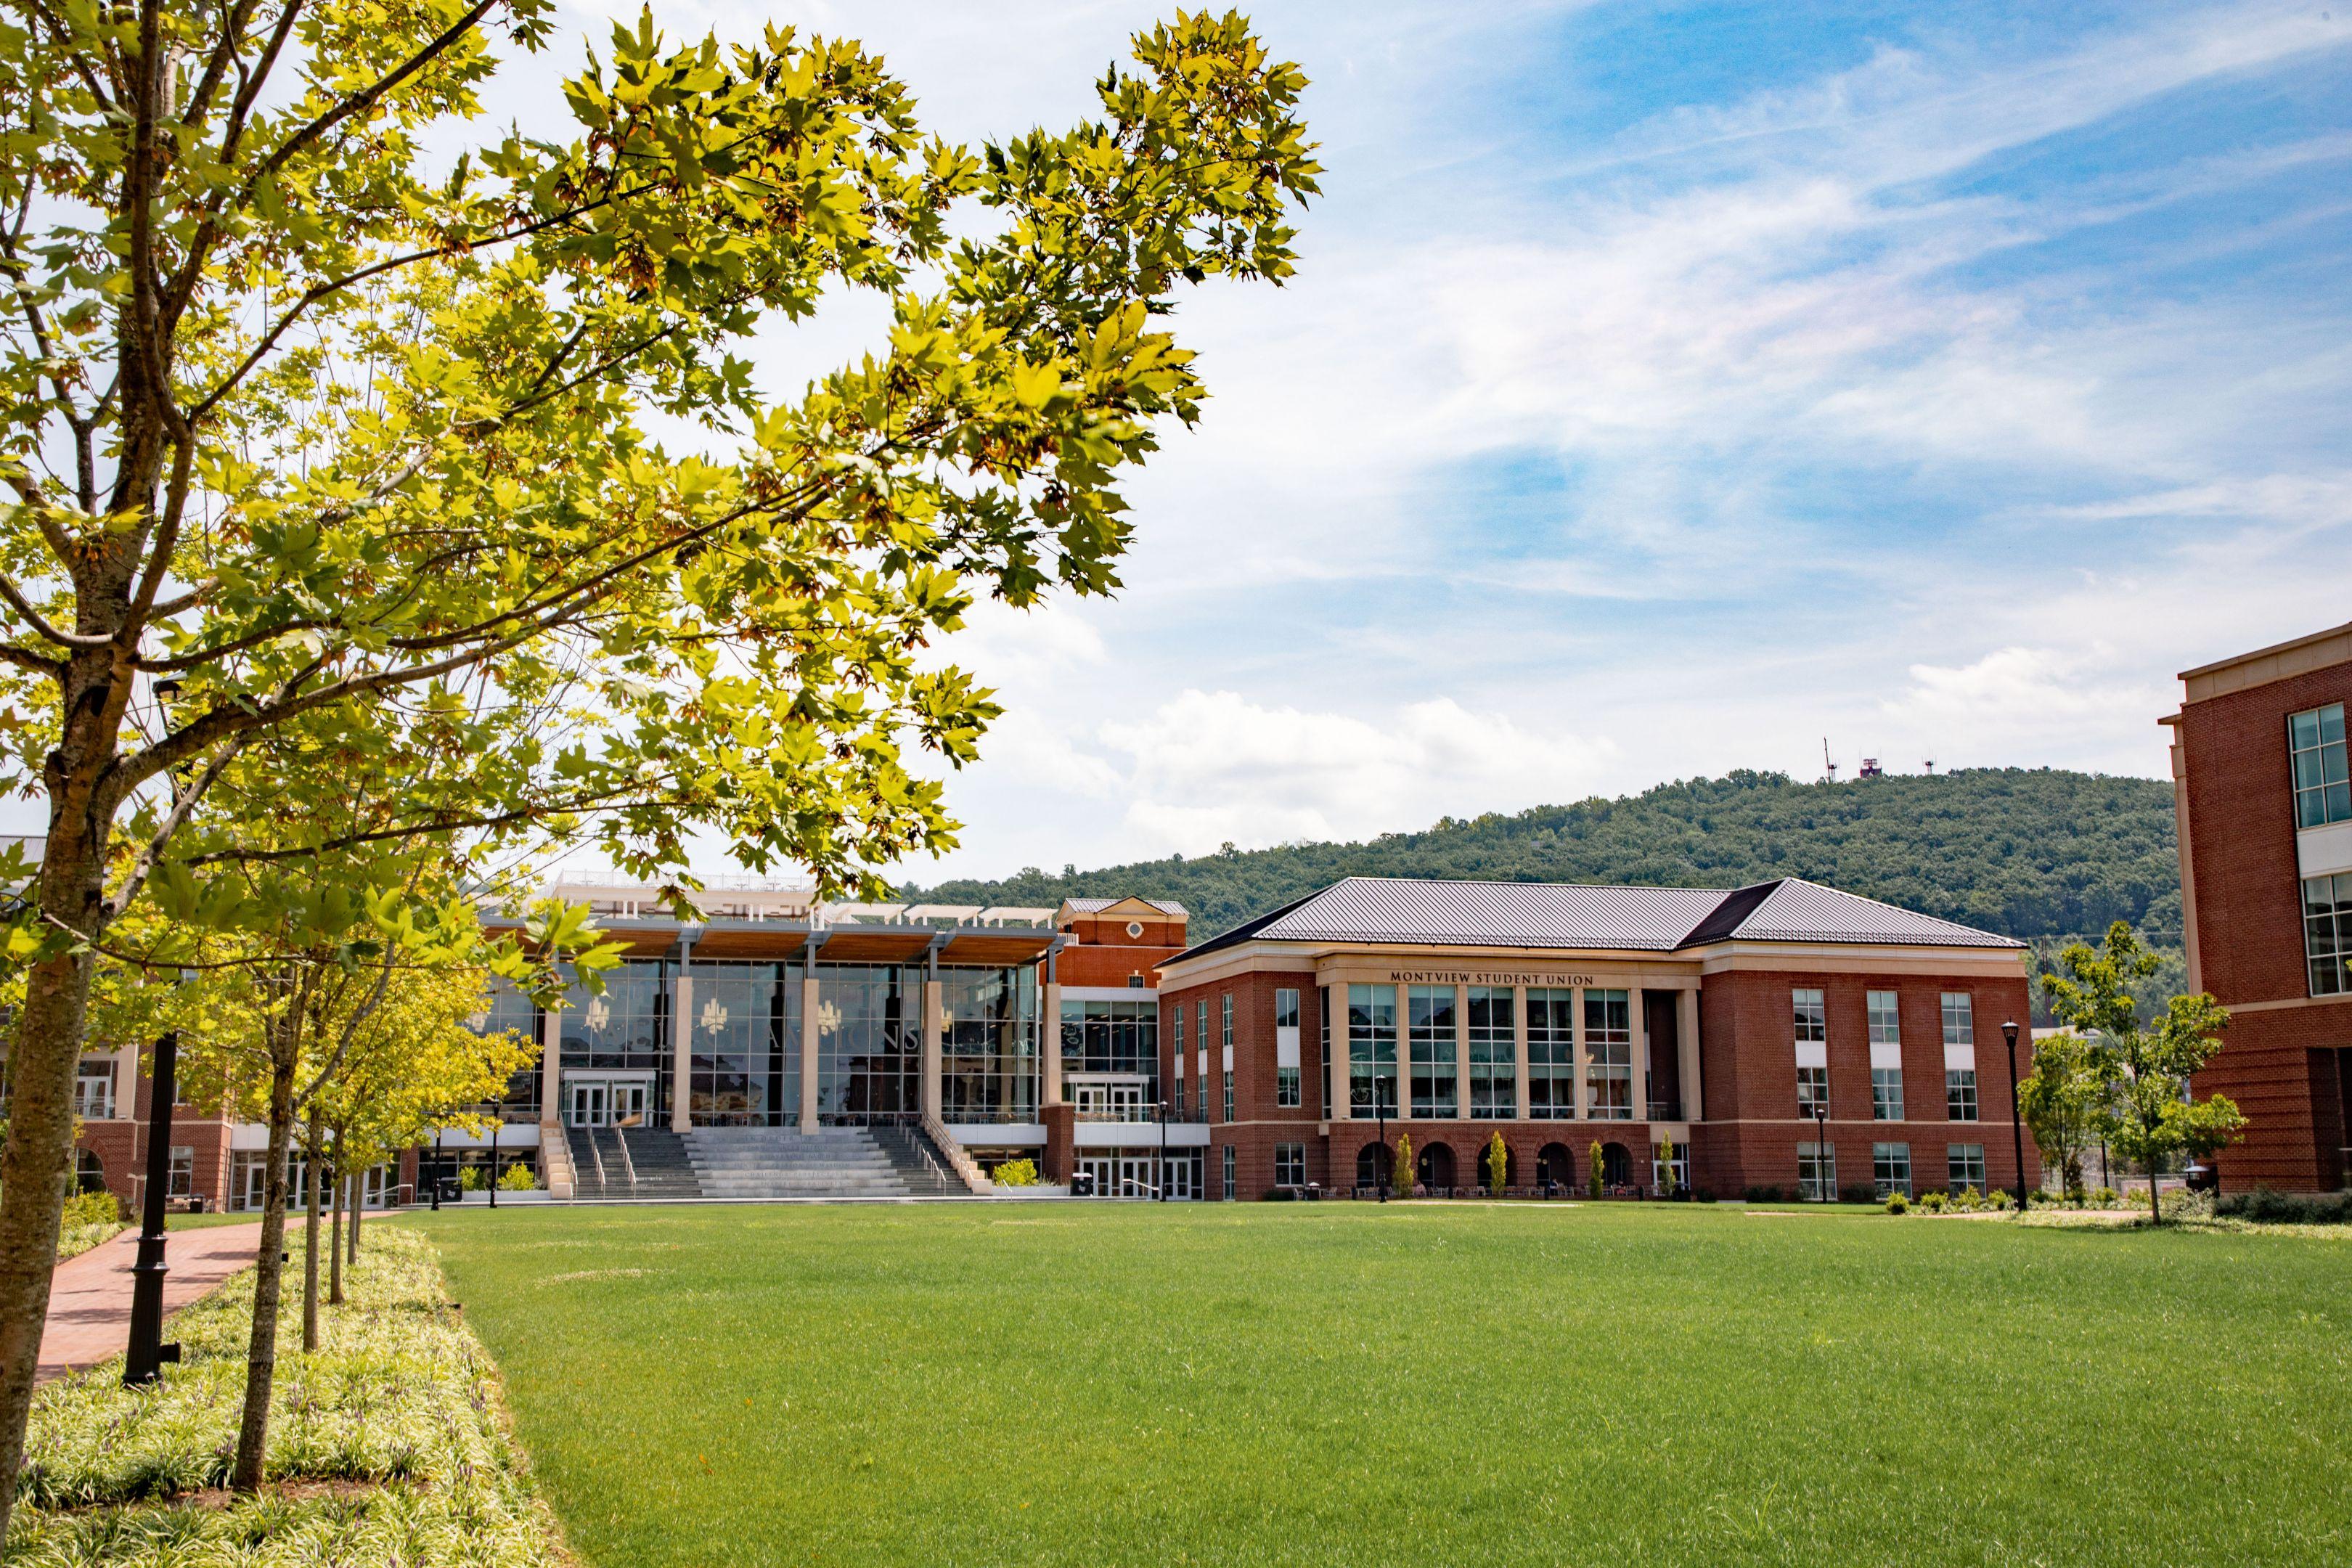 Liberty University's Campus